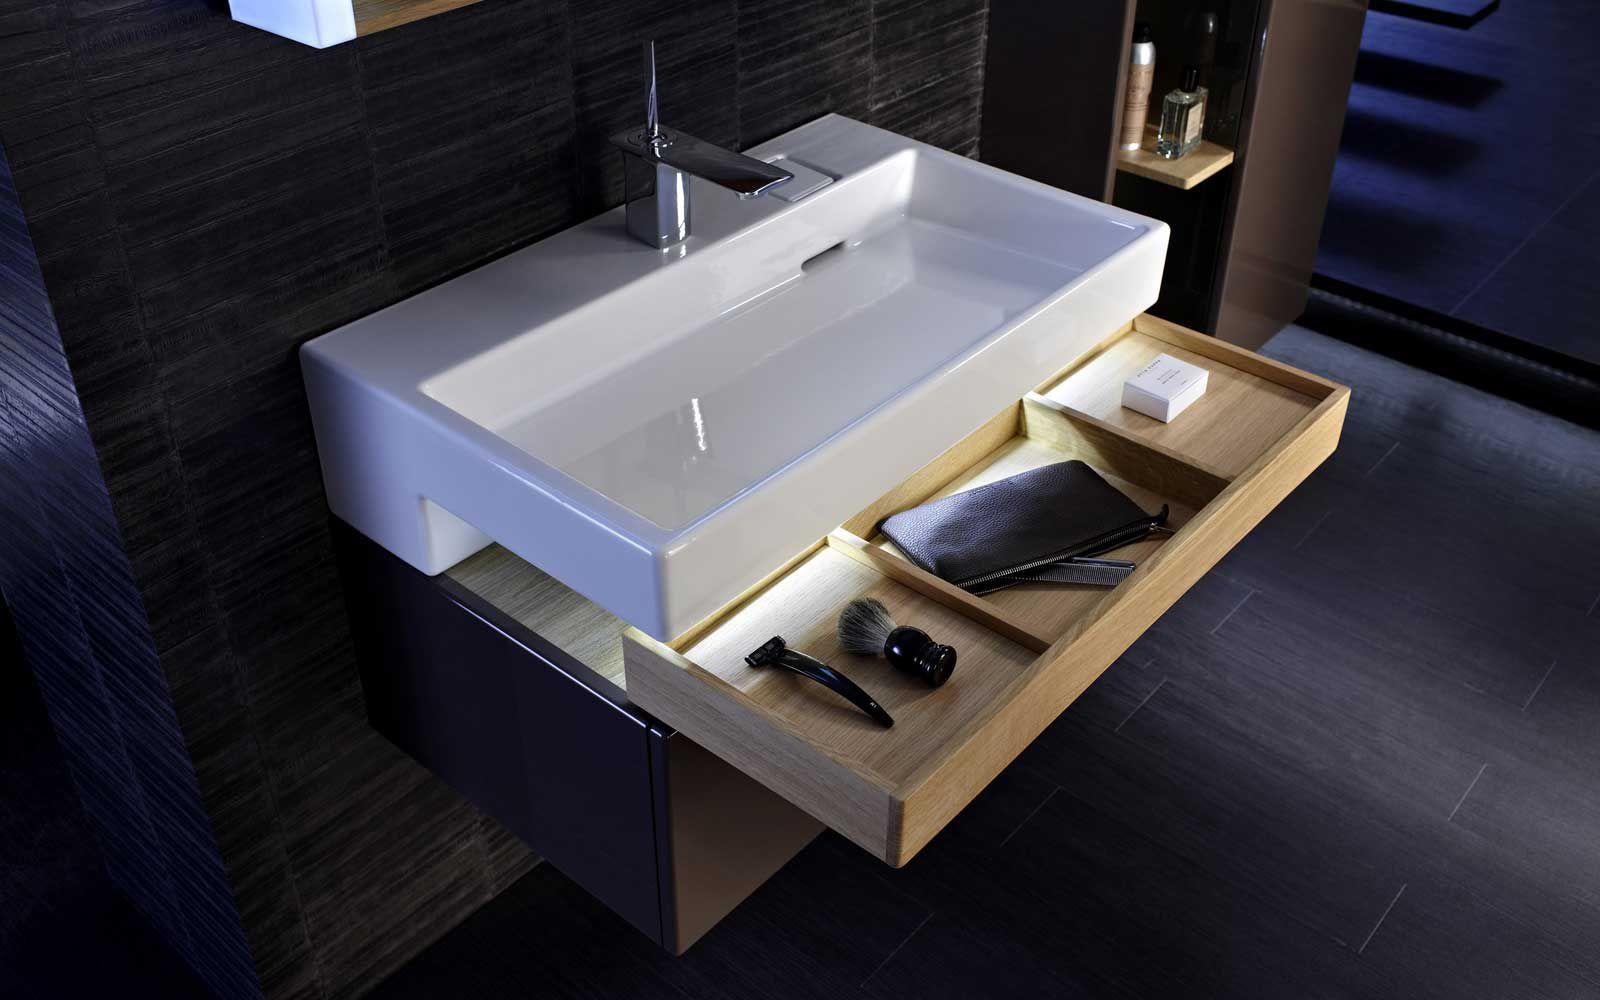 Aufsatz Waschbecken Rechteckig Aus Keramik Modern Terrace